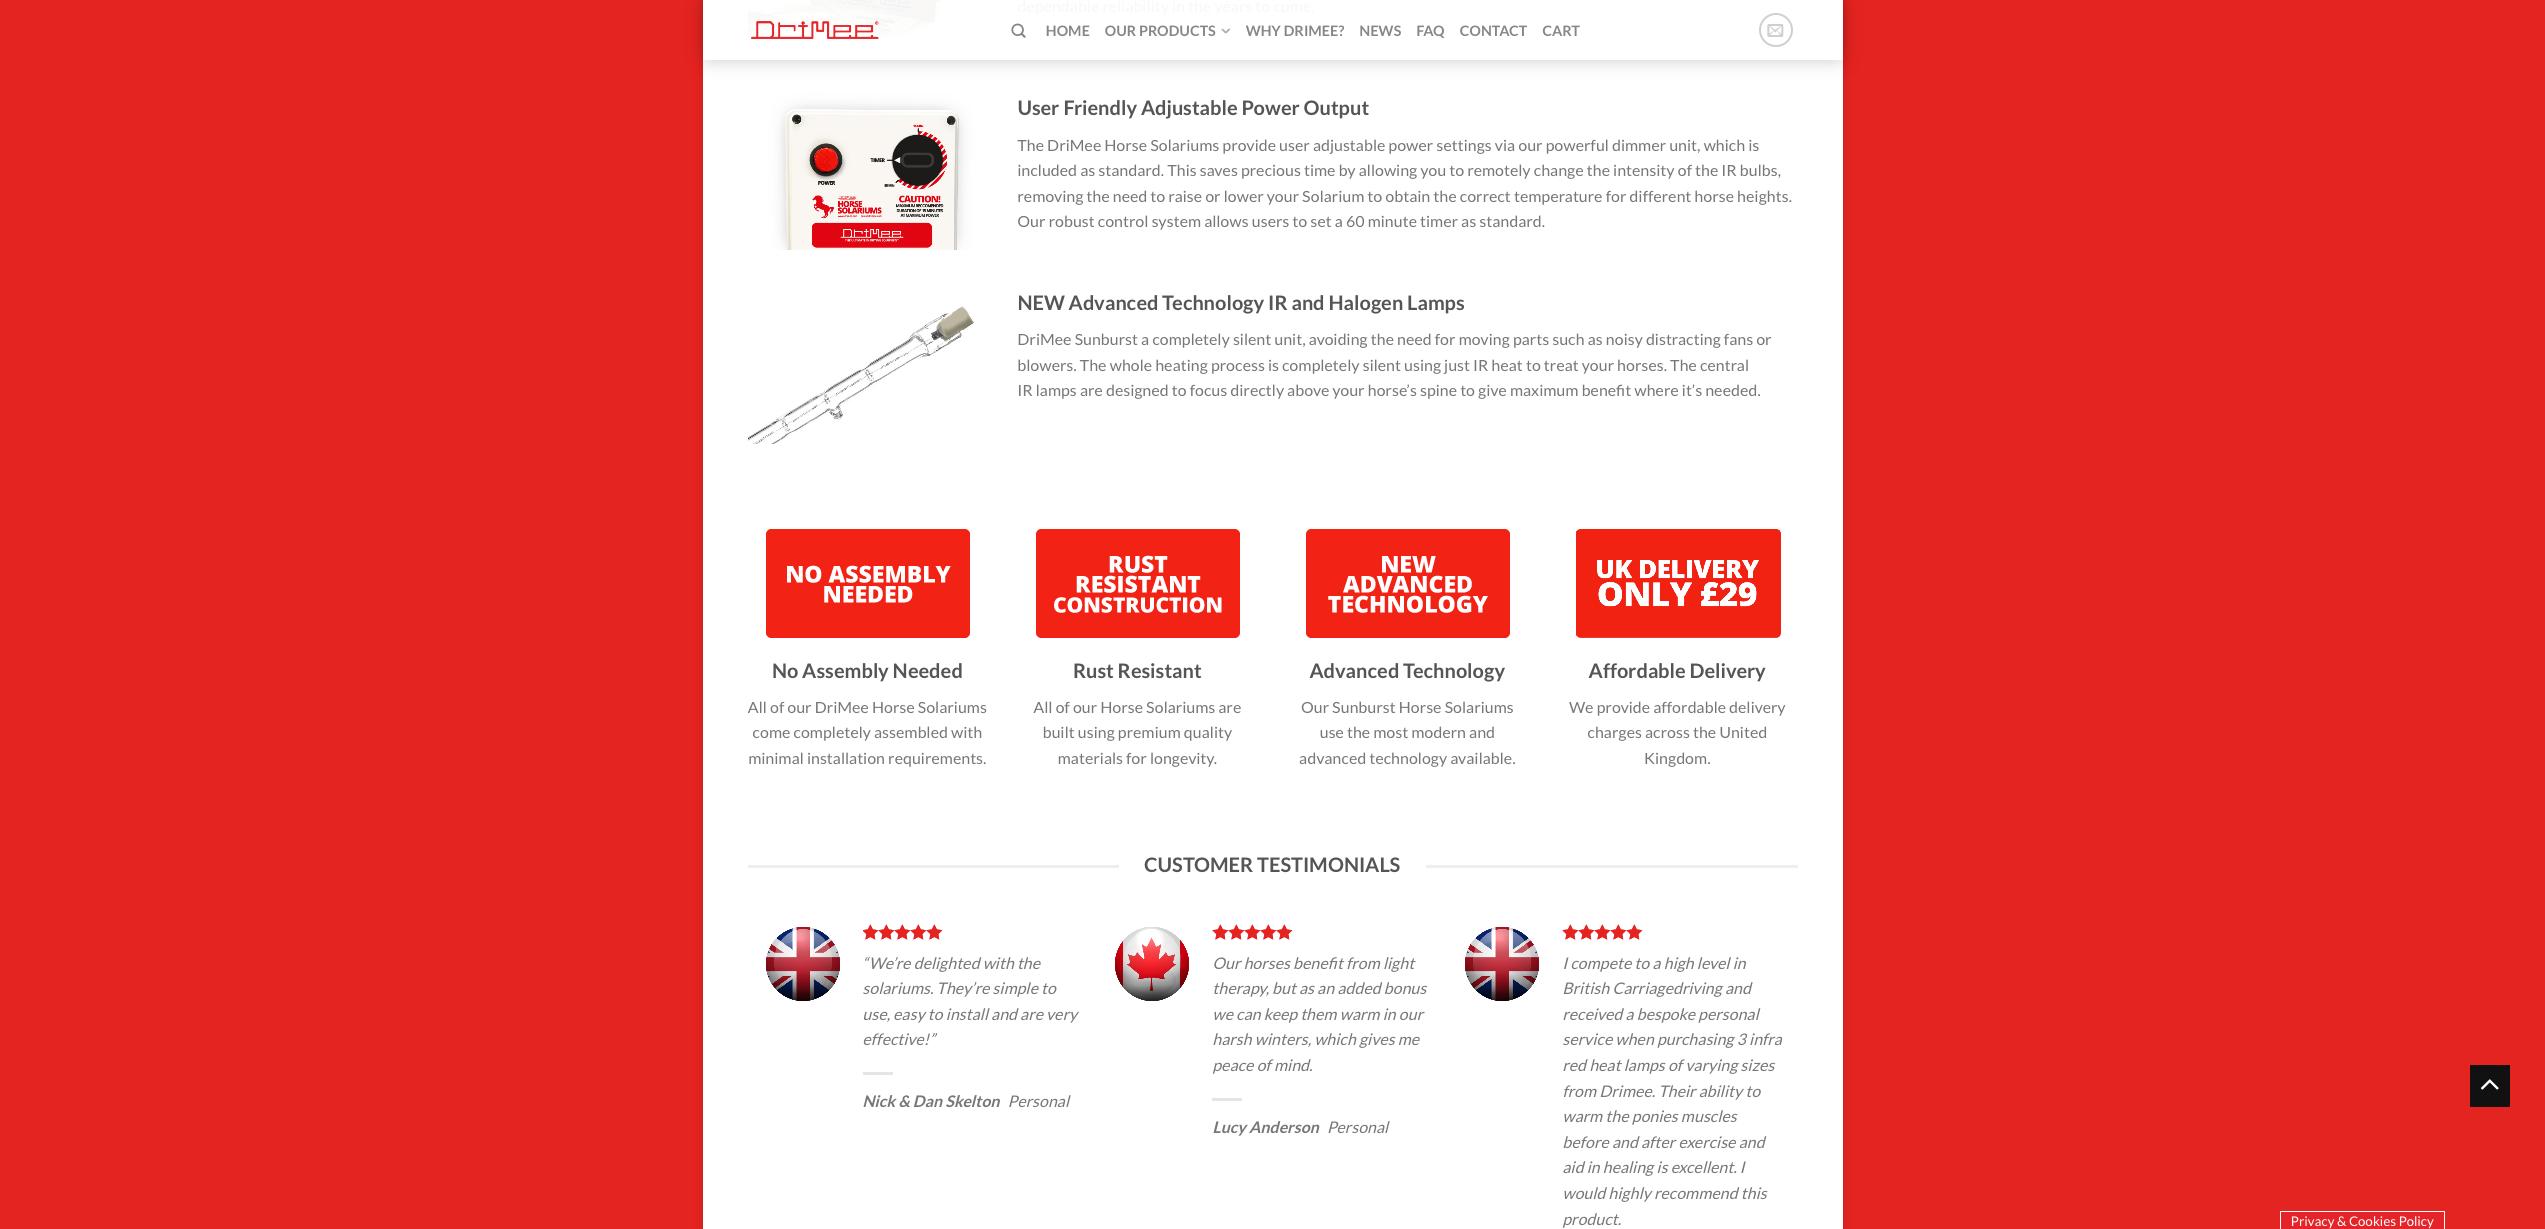 IDEA UK Design and Marketing Drimee Equestrian Horse Equipment Website Design 10